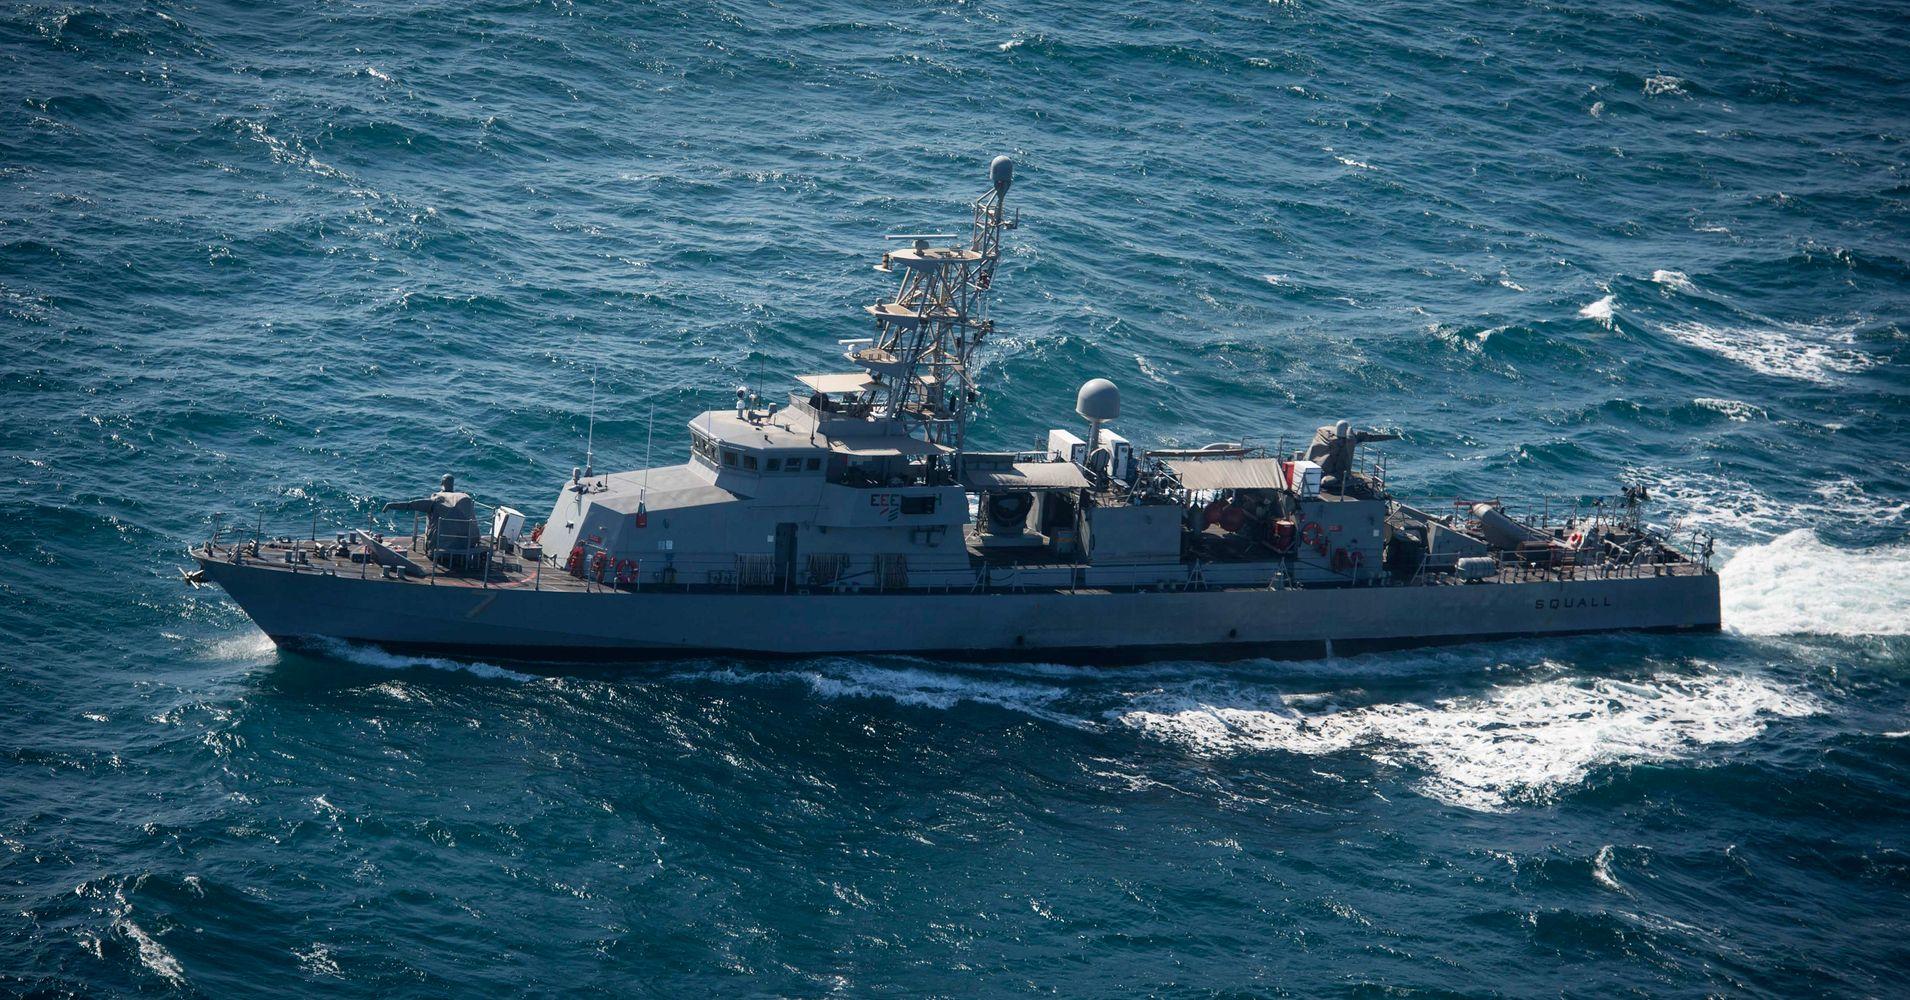 7 Iranian Vessels Harass Navy Ship In Gulf U S Officials